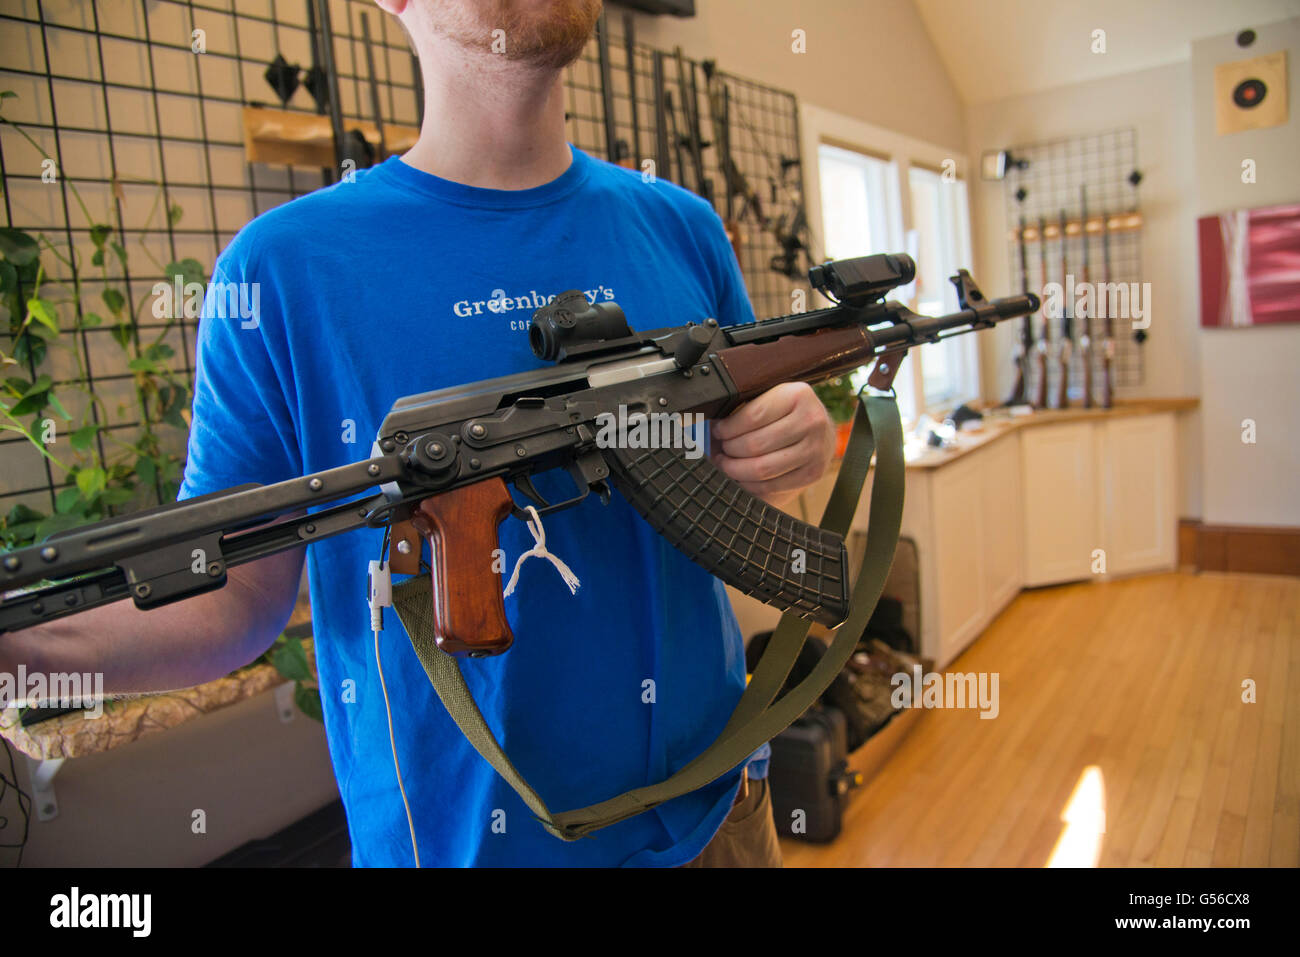 Falls Church, VA, June 19, 2016, USA--A gun owner holds the iconic AK-47 machine gun in a gun shop in Virginia. Stock Photo